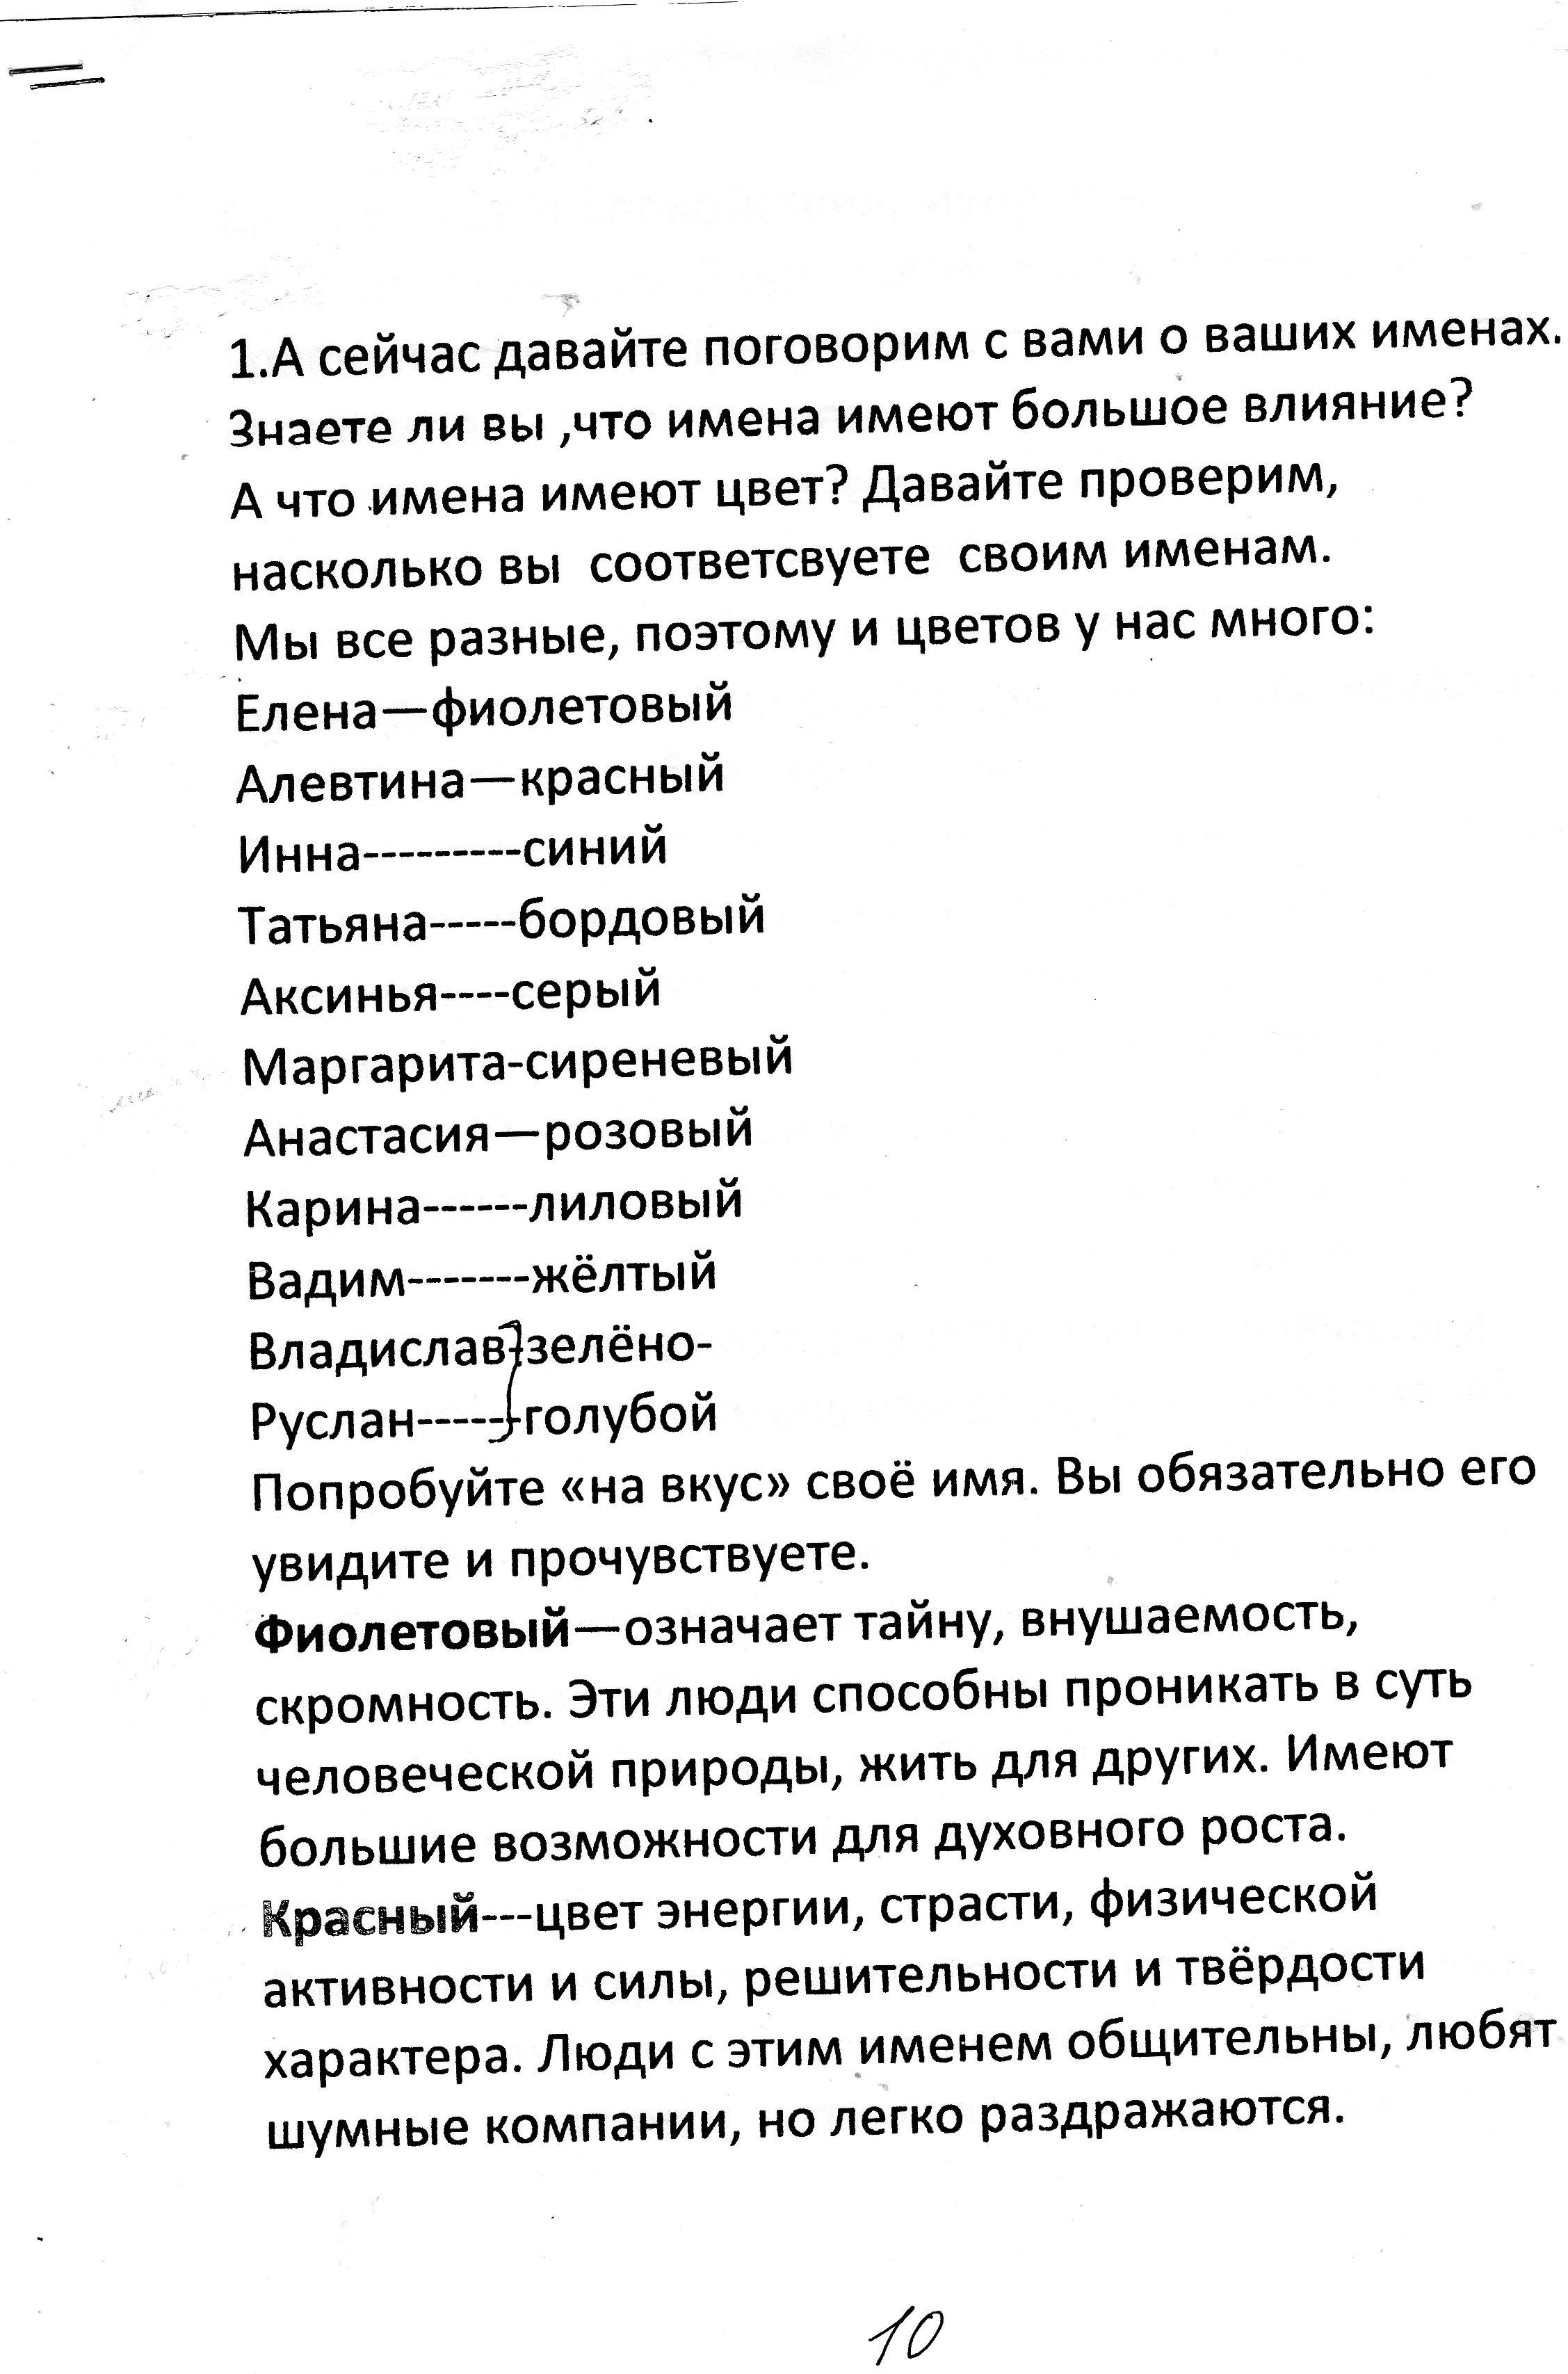 C:\Documents and Settings\ADMIN\Мои документы\9 кл выпускной\img016.jpg